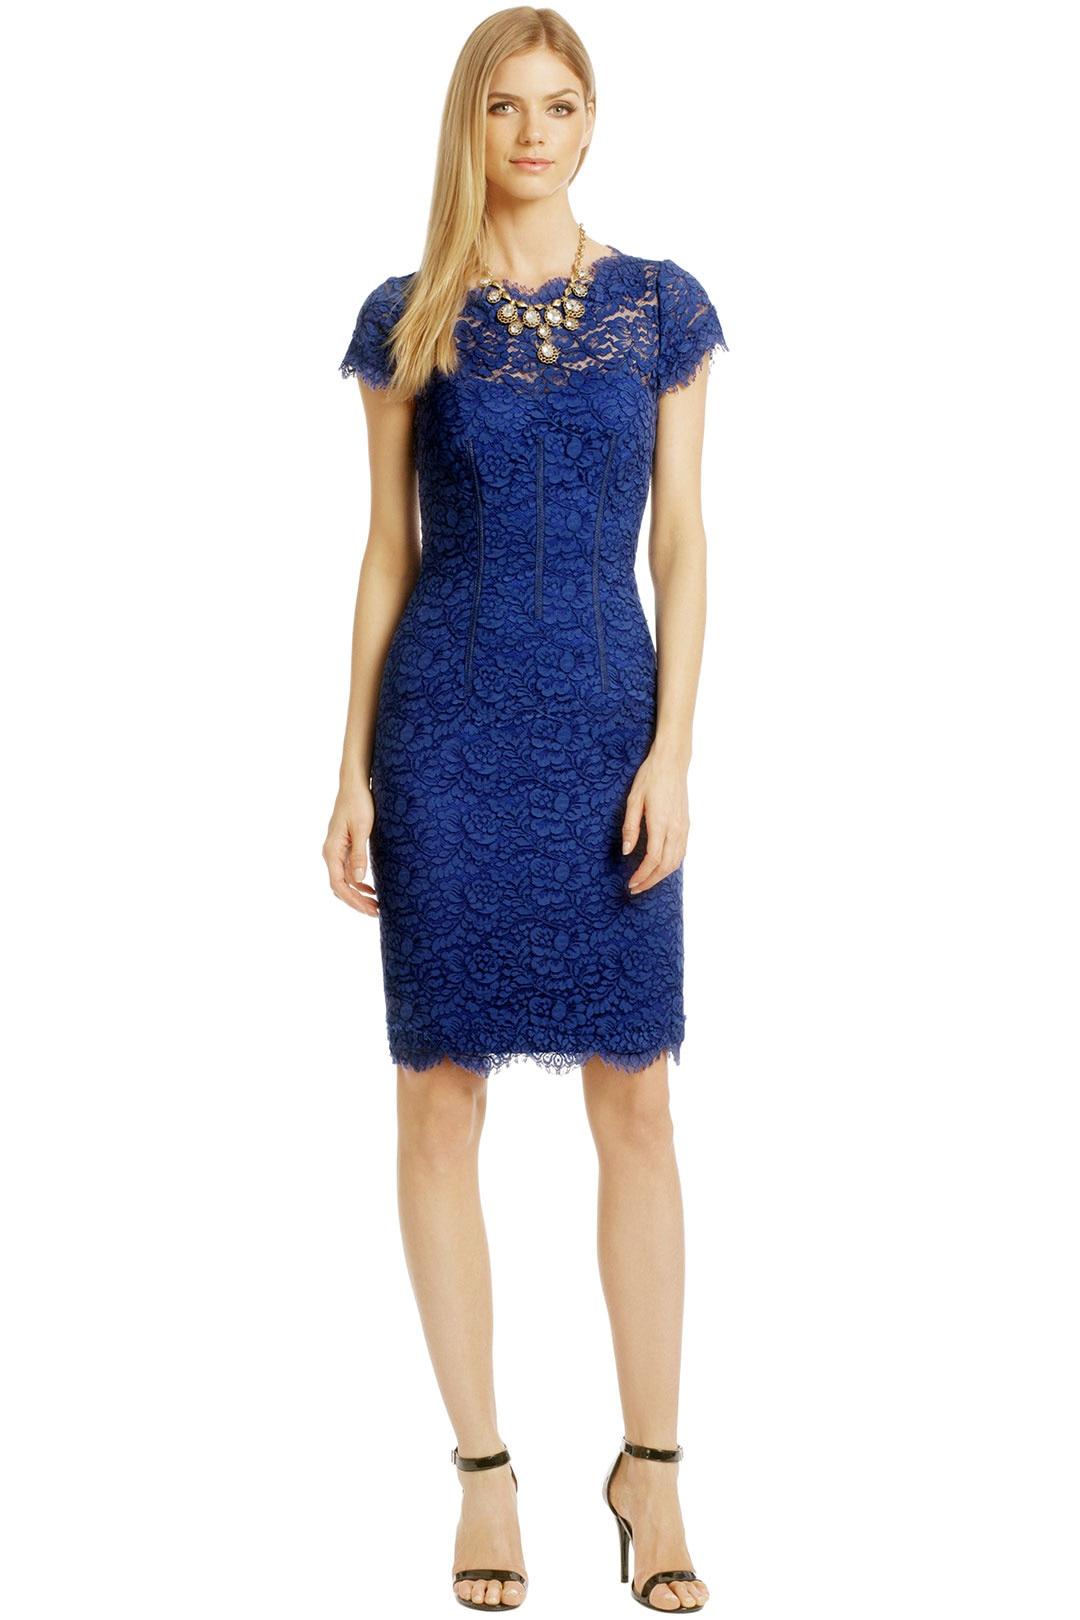 Homecoming Dresses Royal Blue Lace Scoop Neck Knee Length Short Girls Graduation Dress Cap Sleeve Open